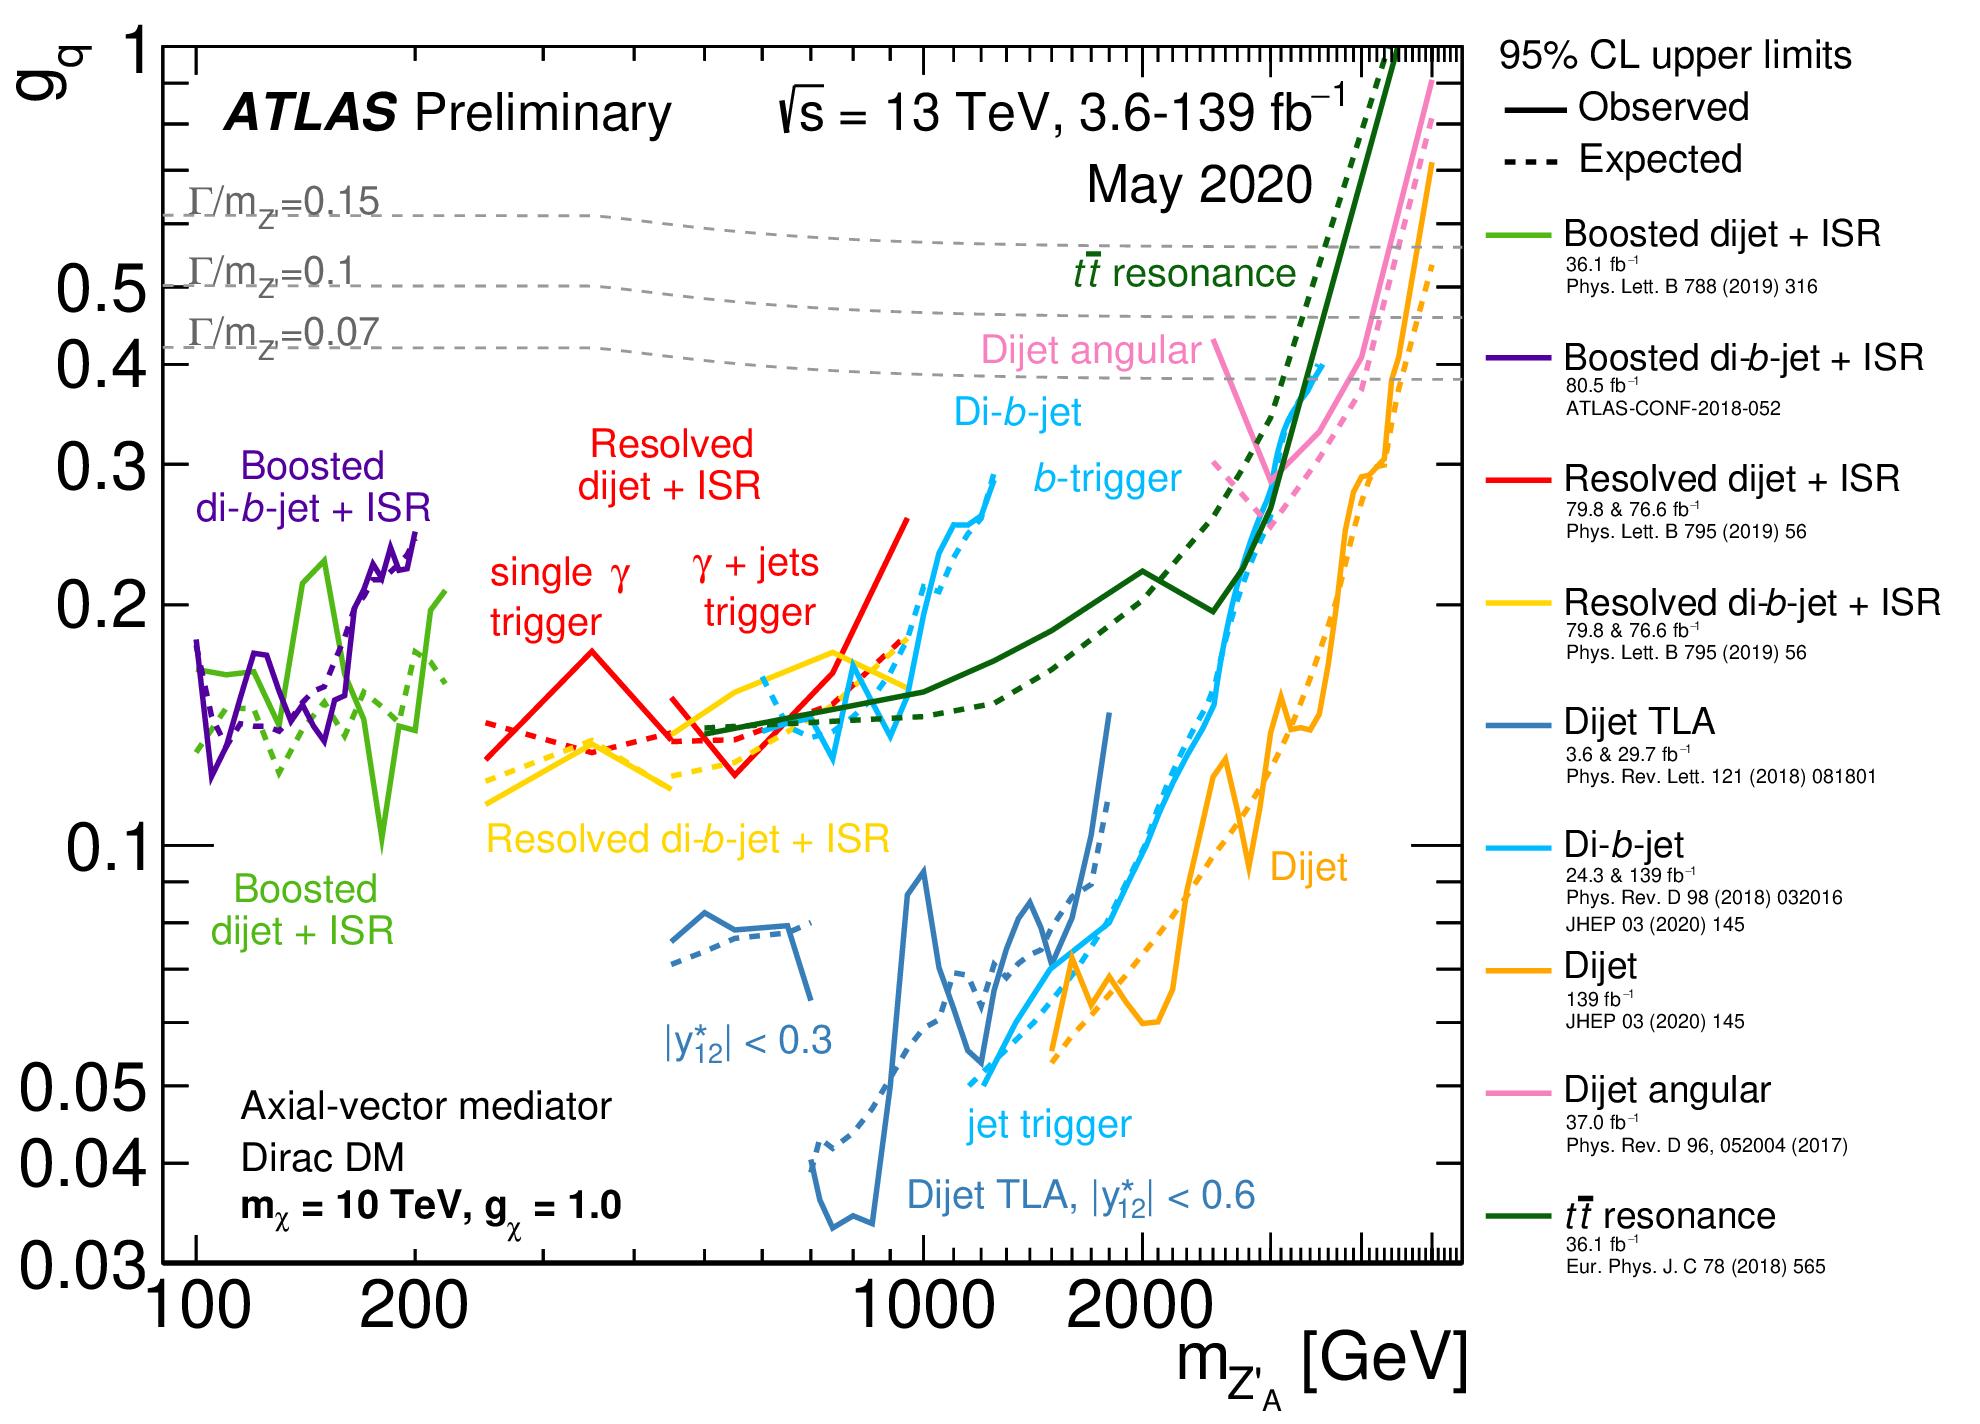 https://atlas.web.cern.ch/Atlas/GROUPS/PHYSICS/CombinedSummaryPlots/EXOTICS/ATLAS_DarkMatterCoupling_Summary_0labels/ATLAS_DarkMatterCoupling_Summary_0labels.png